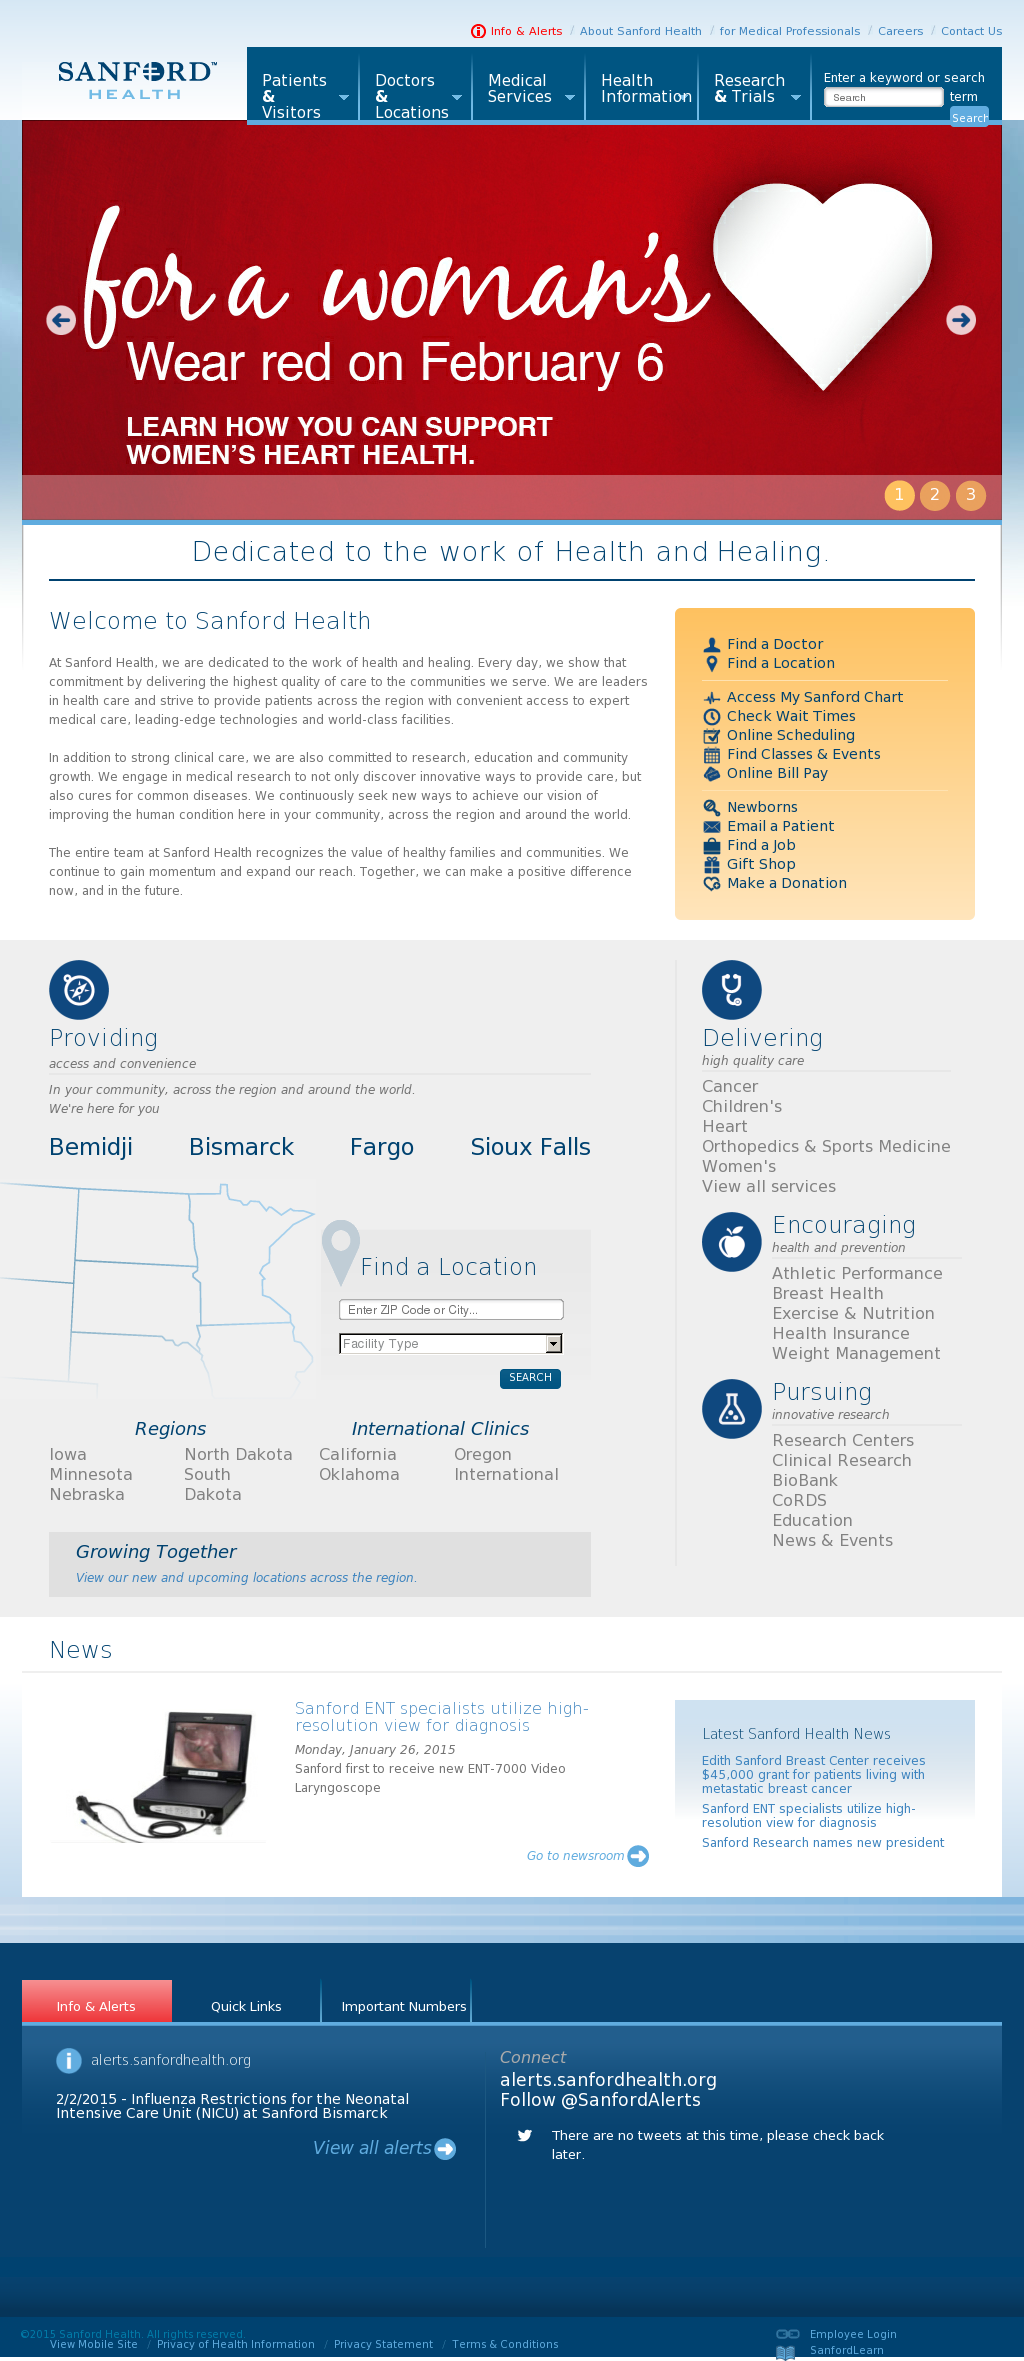 Owler Reports - Press Release: Sanford Health : Profile